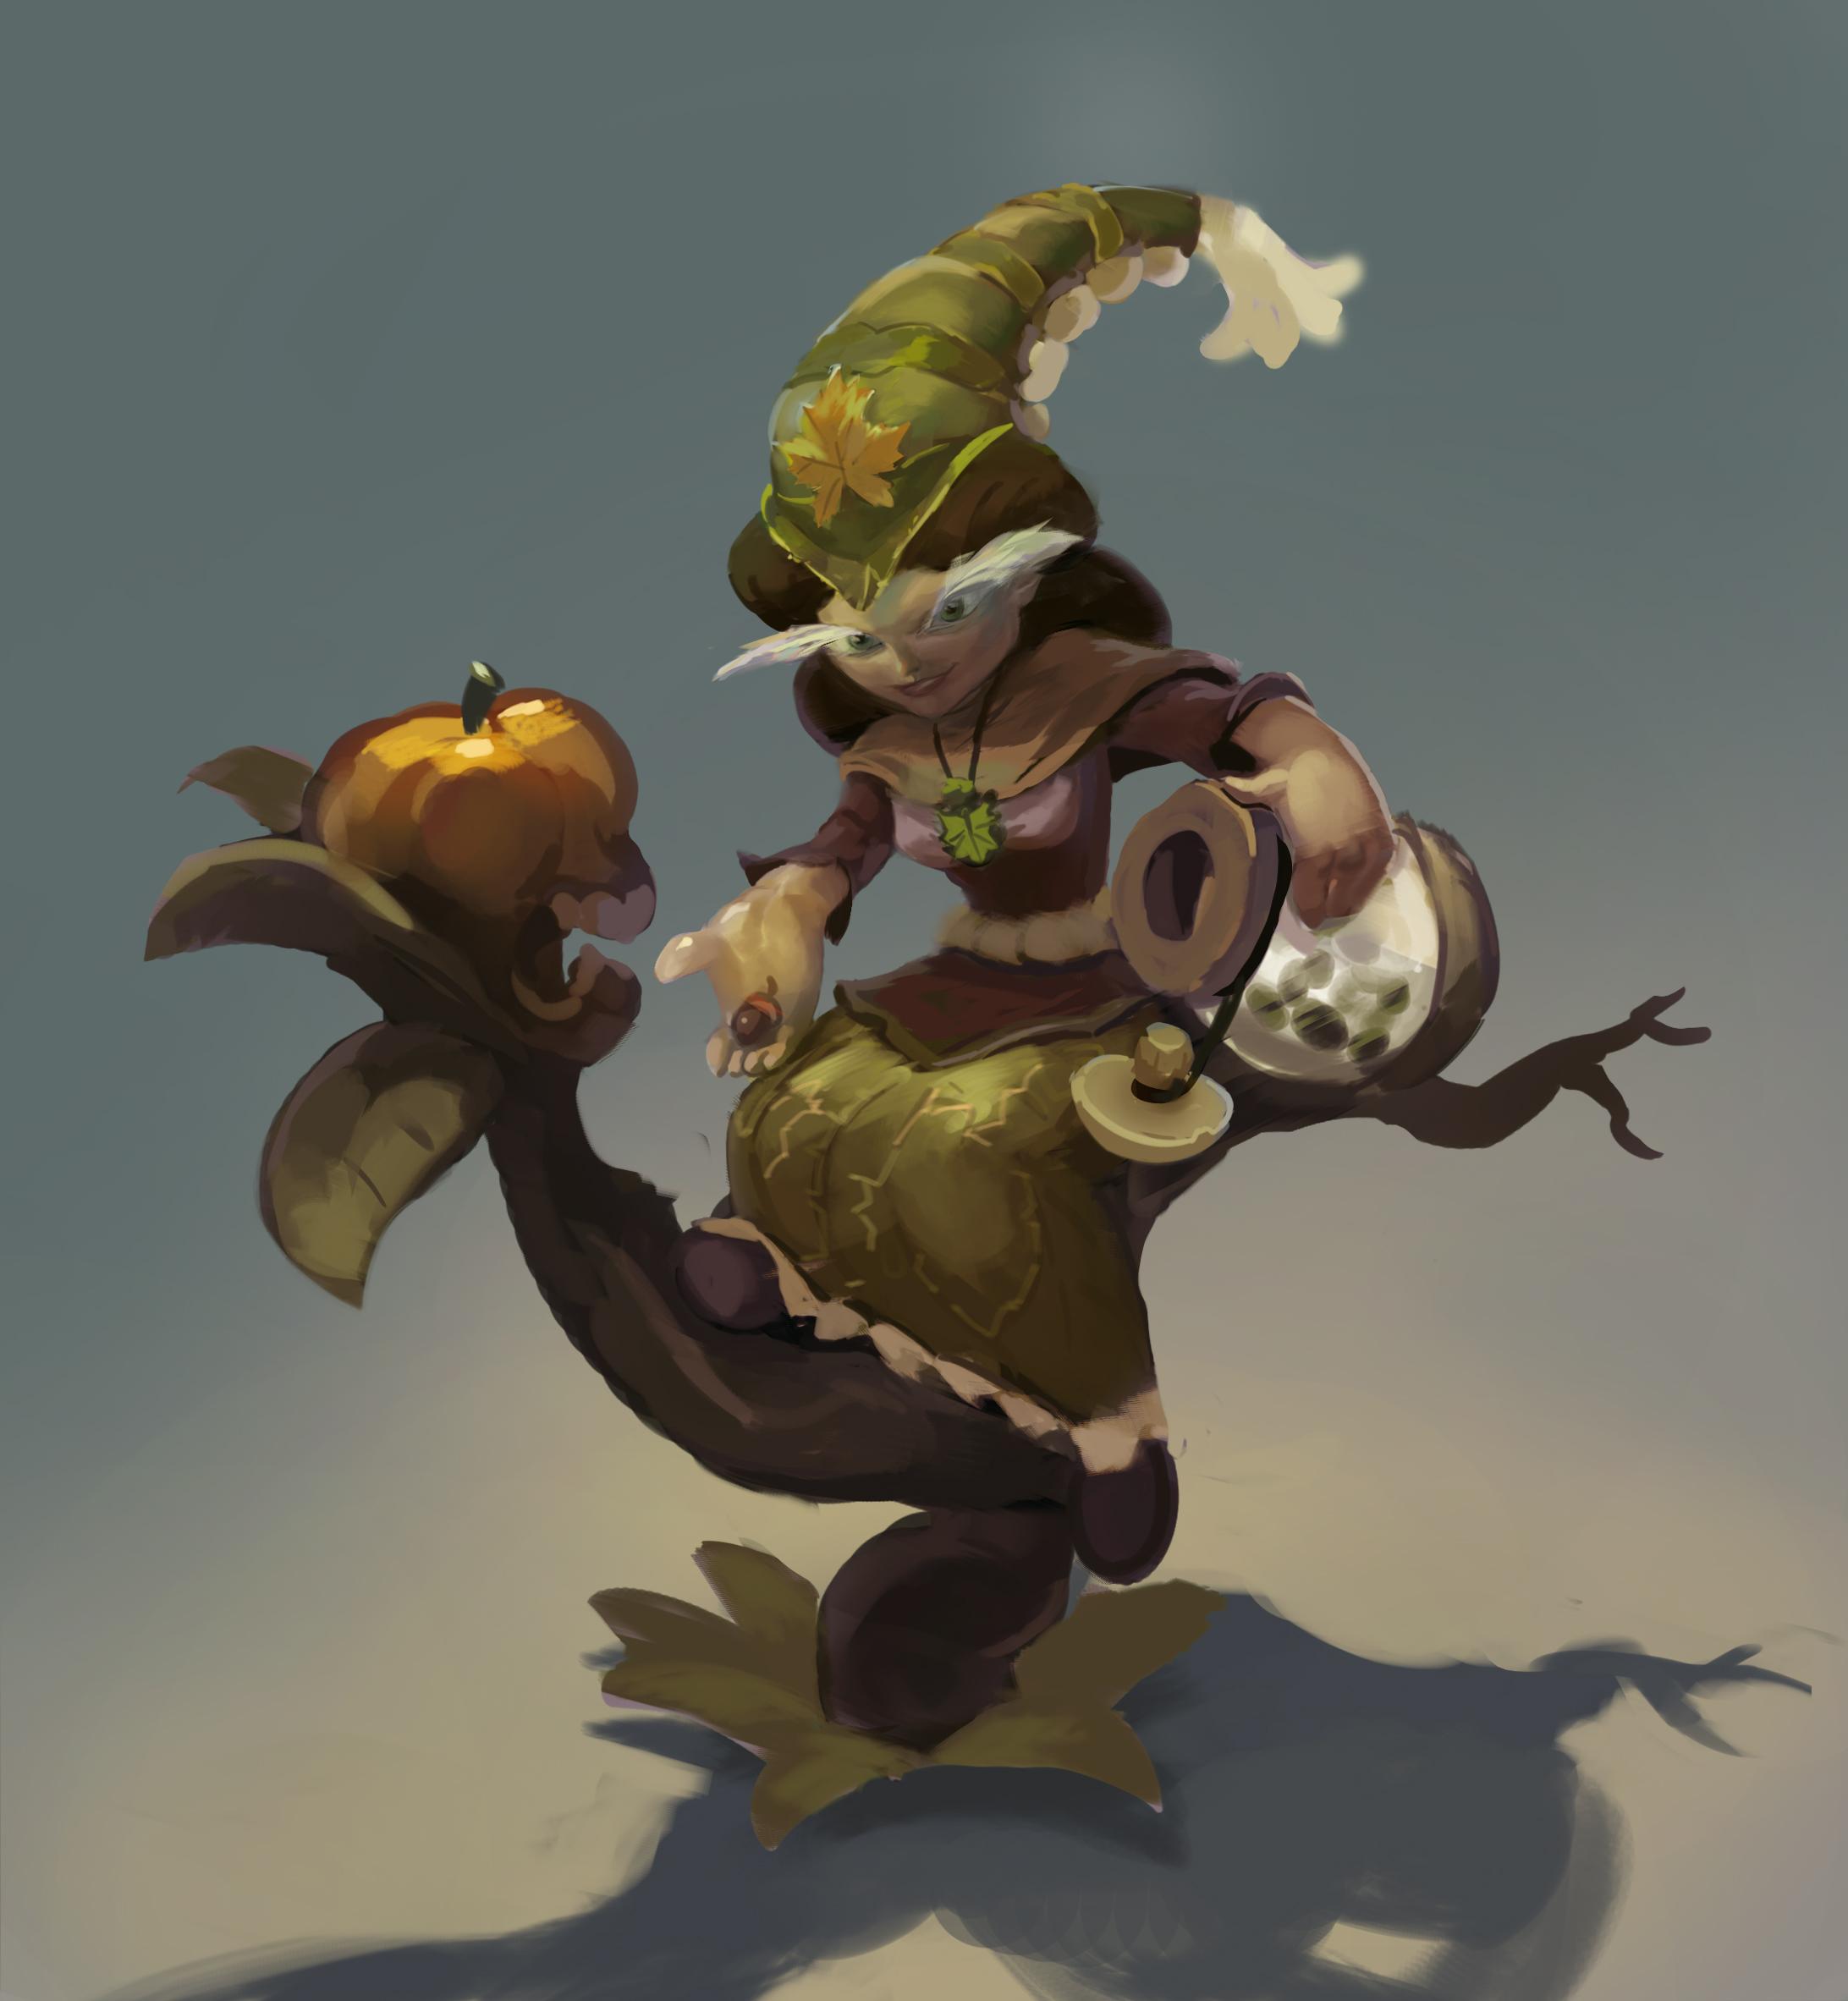 ведьма, помошник, охотник1.jpg